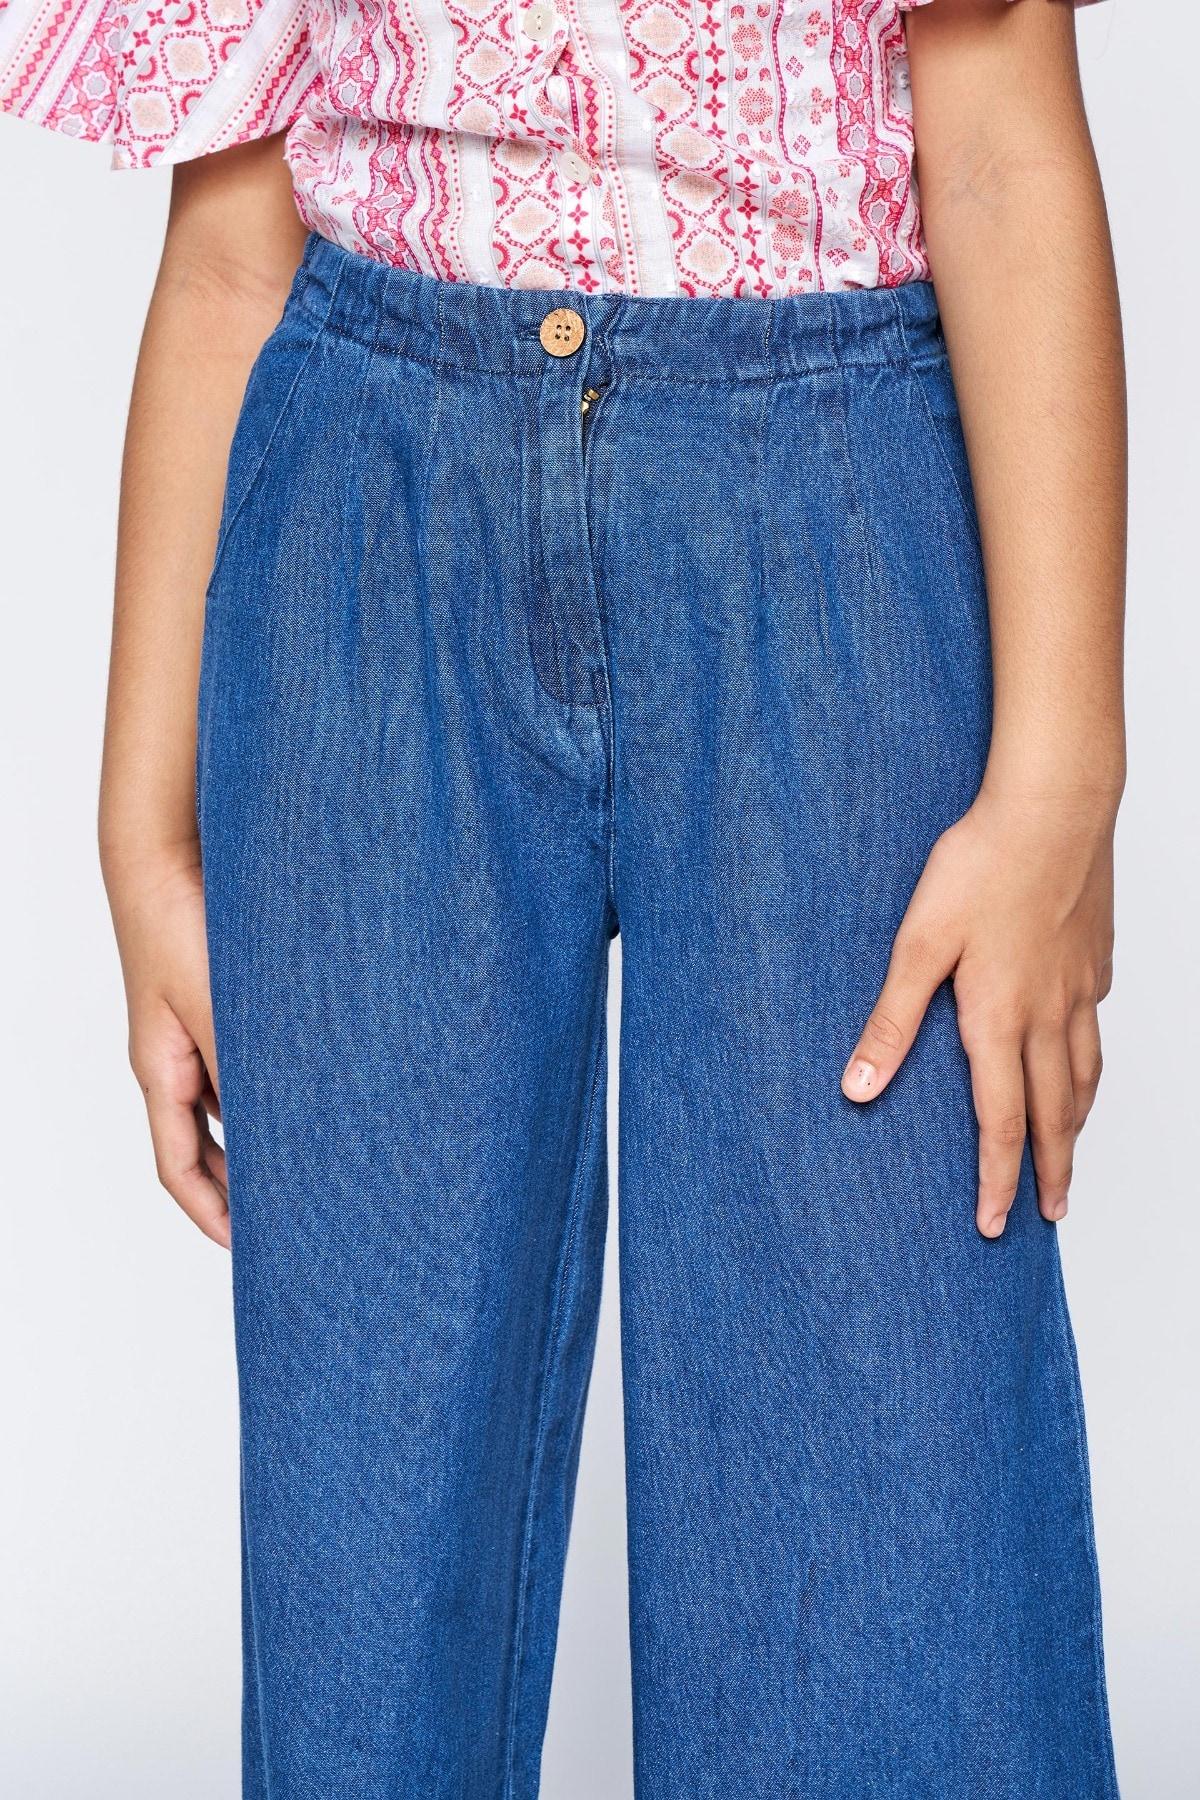 Global Desi | Blue Embroidered Curved Bottom